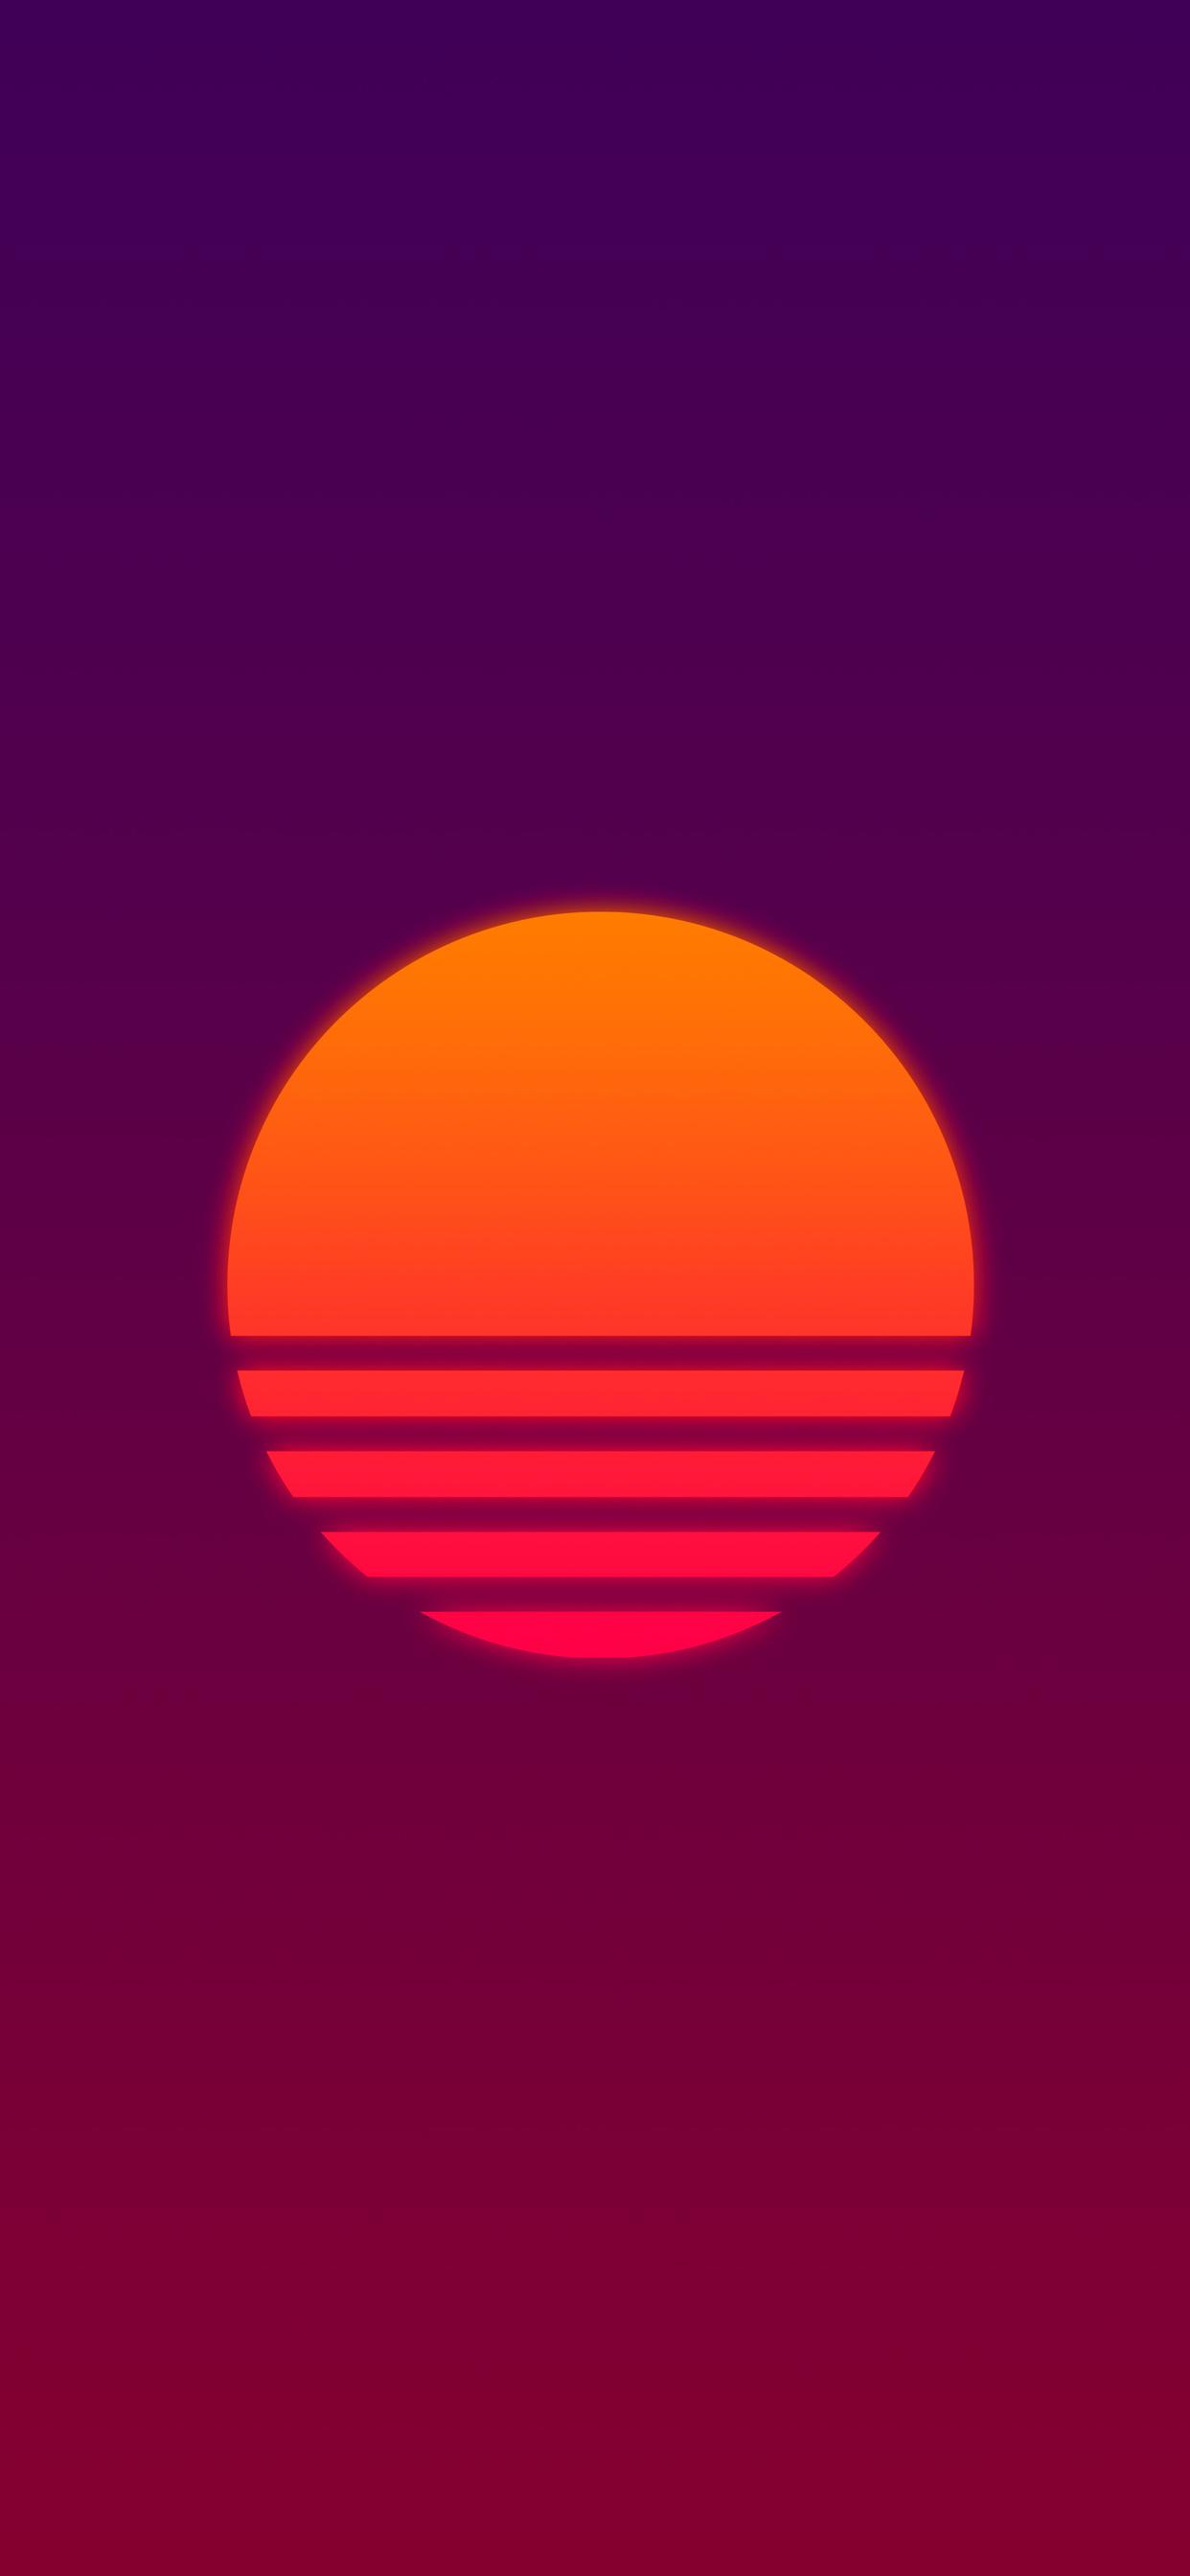 abstract-sun-8k-m1.jpg